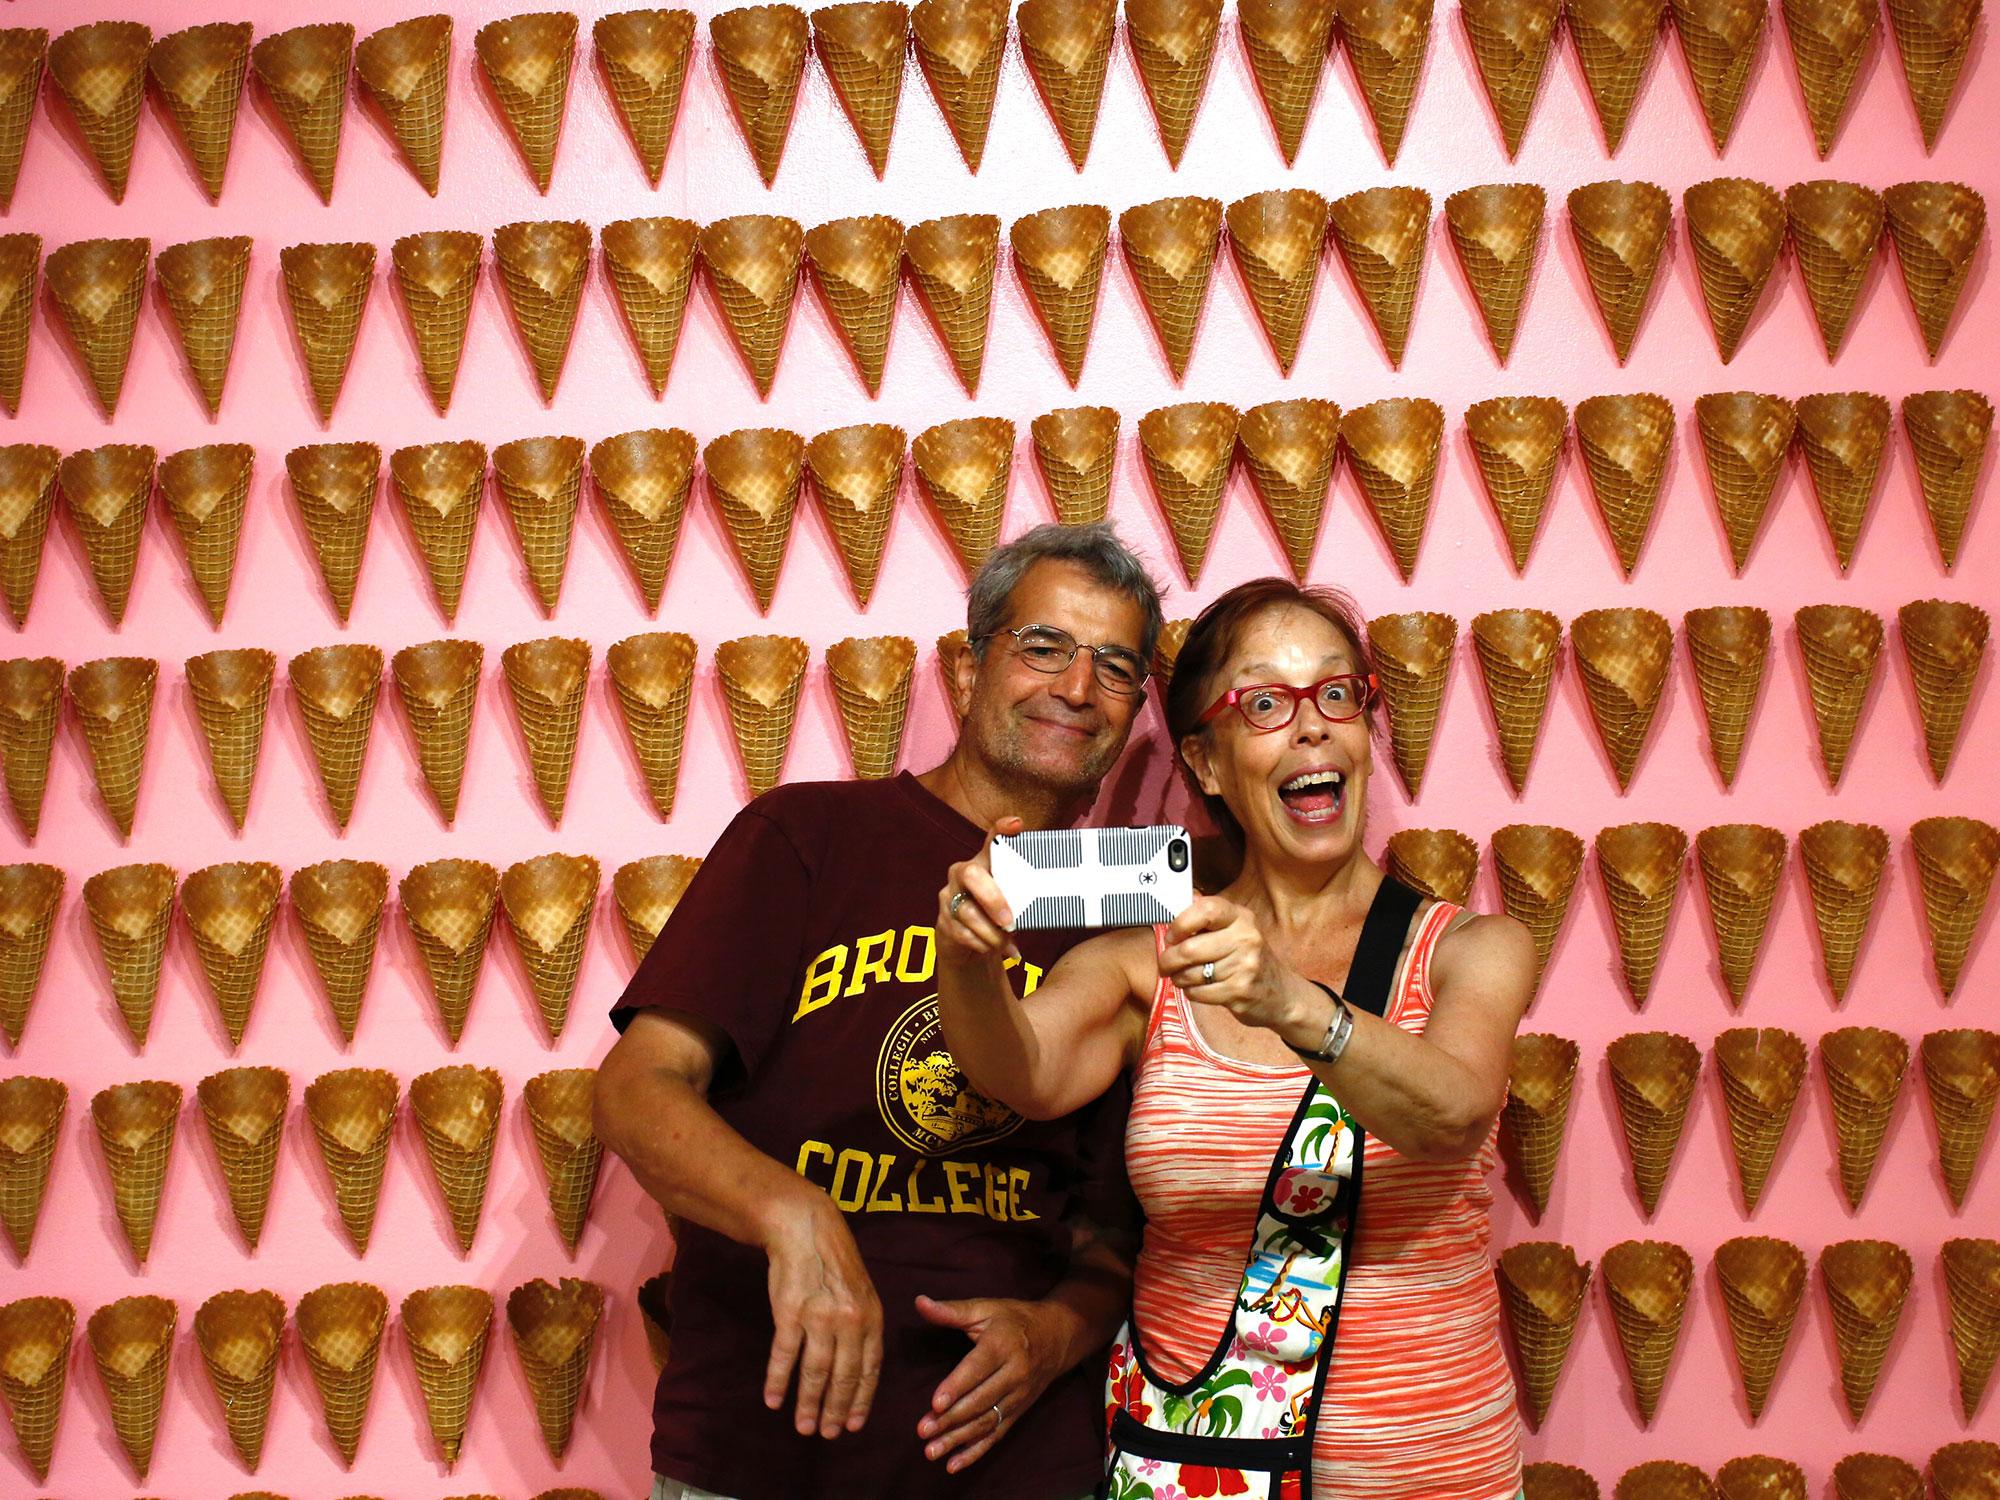 ice-cream-museum.jpg